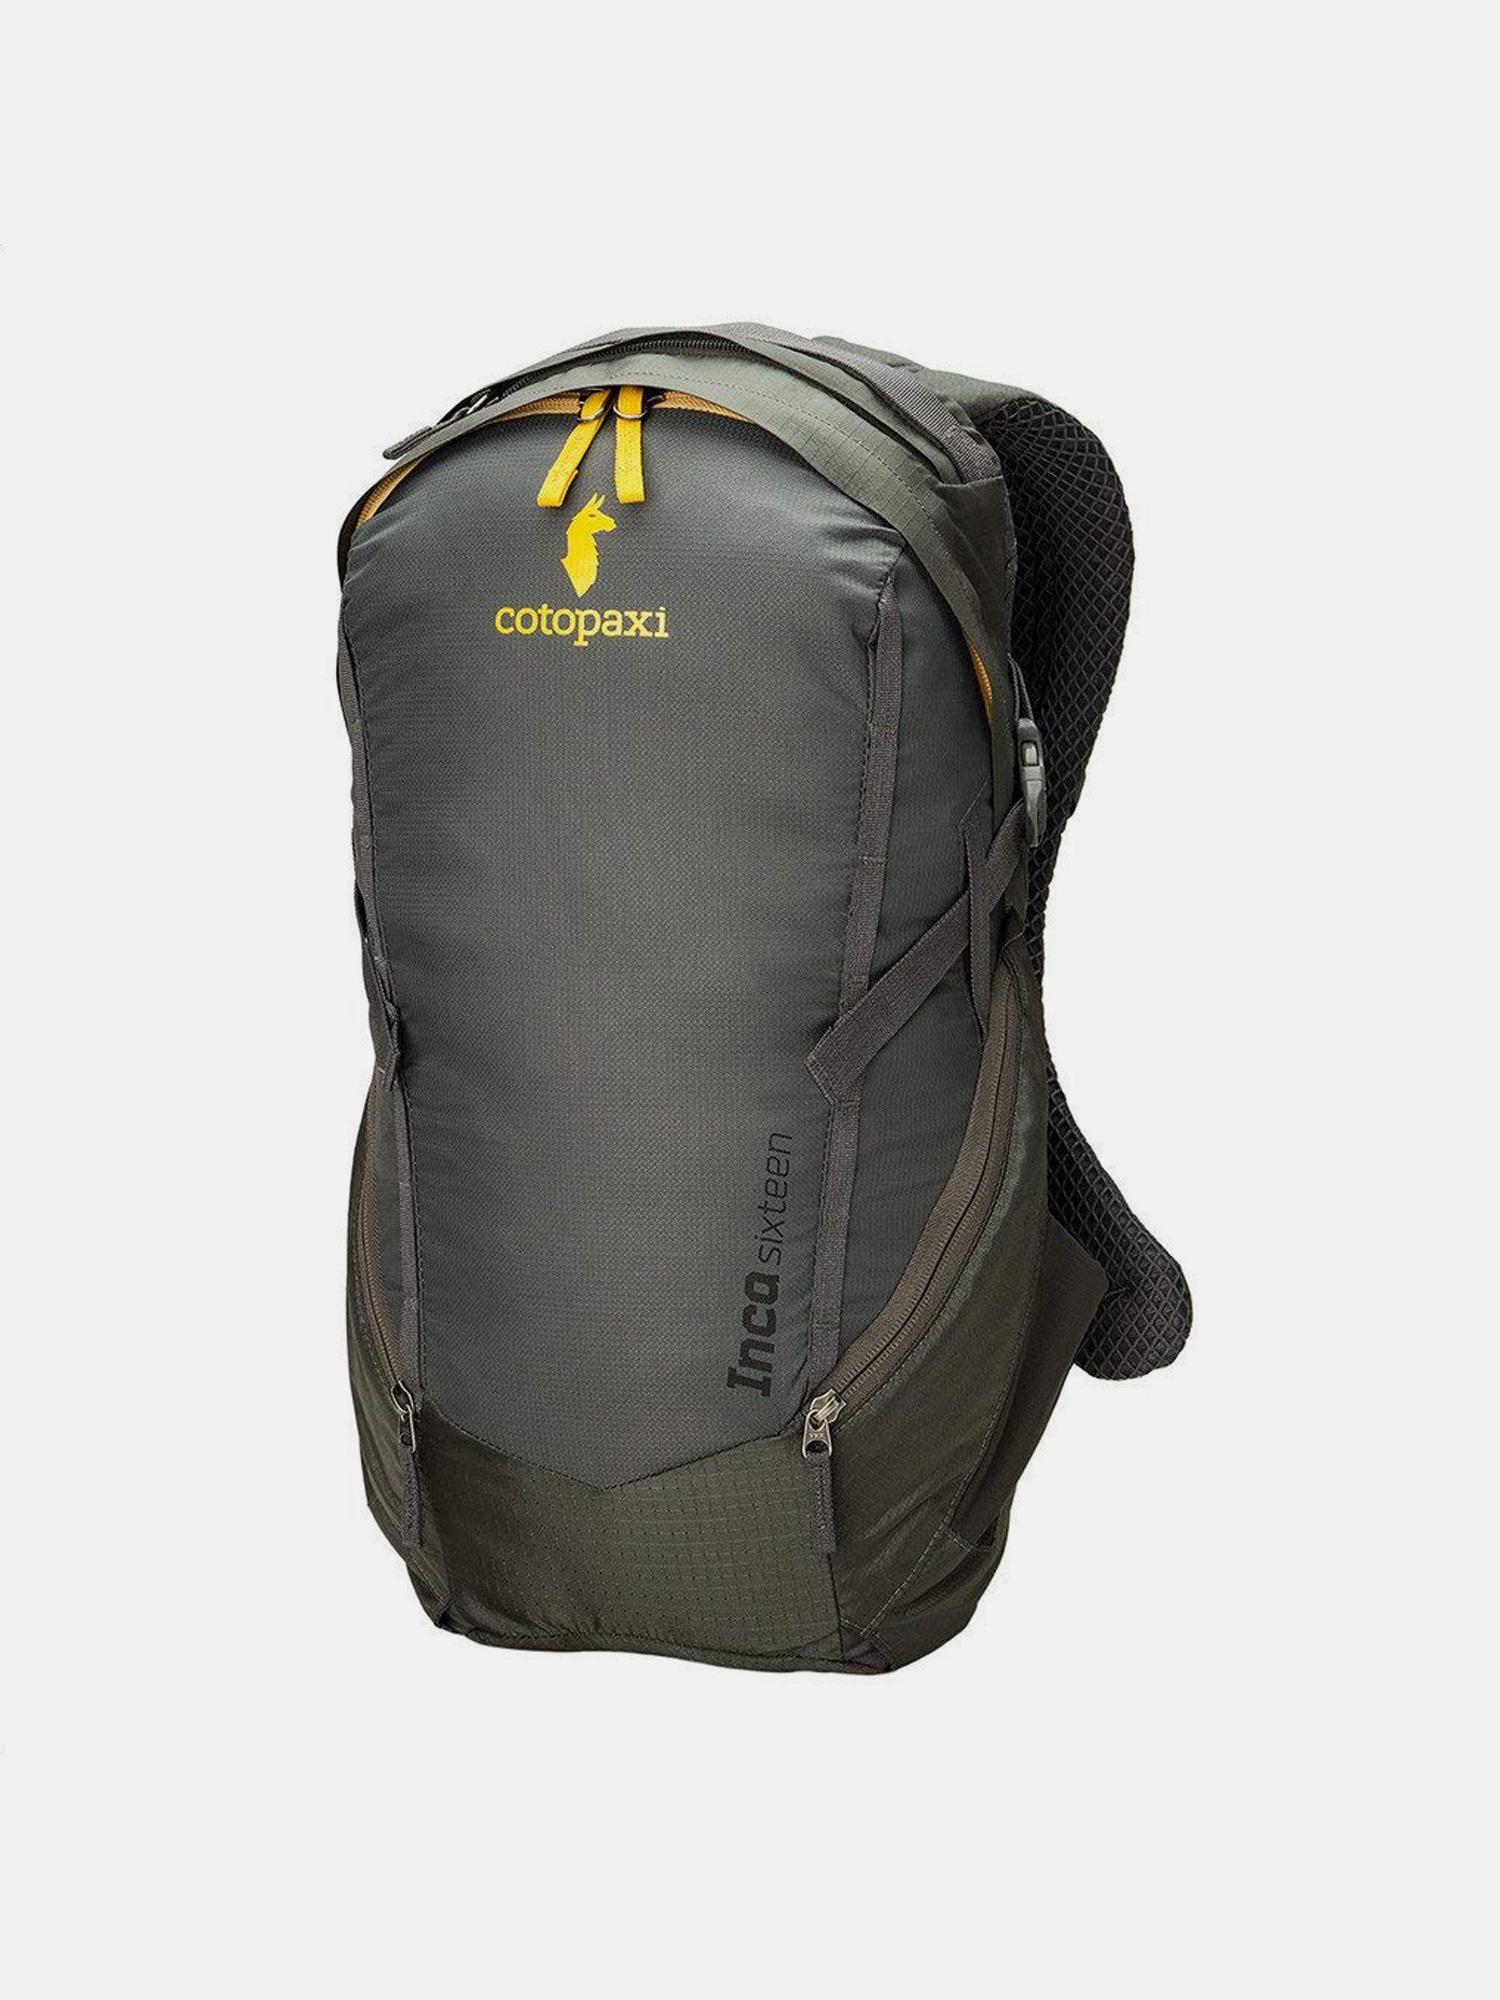 Cotopaxi Inca Technical Daypack - $70